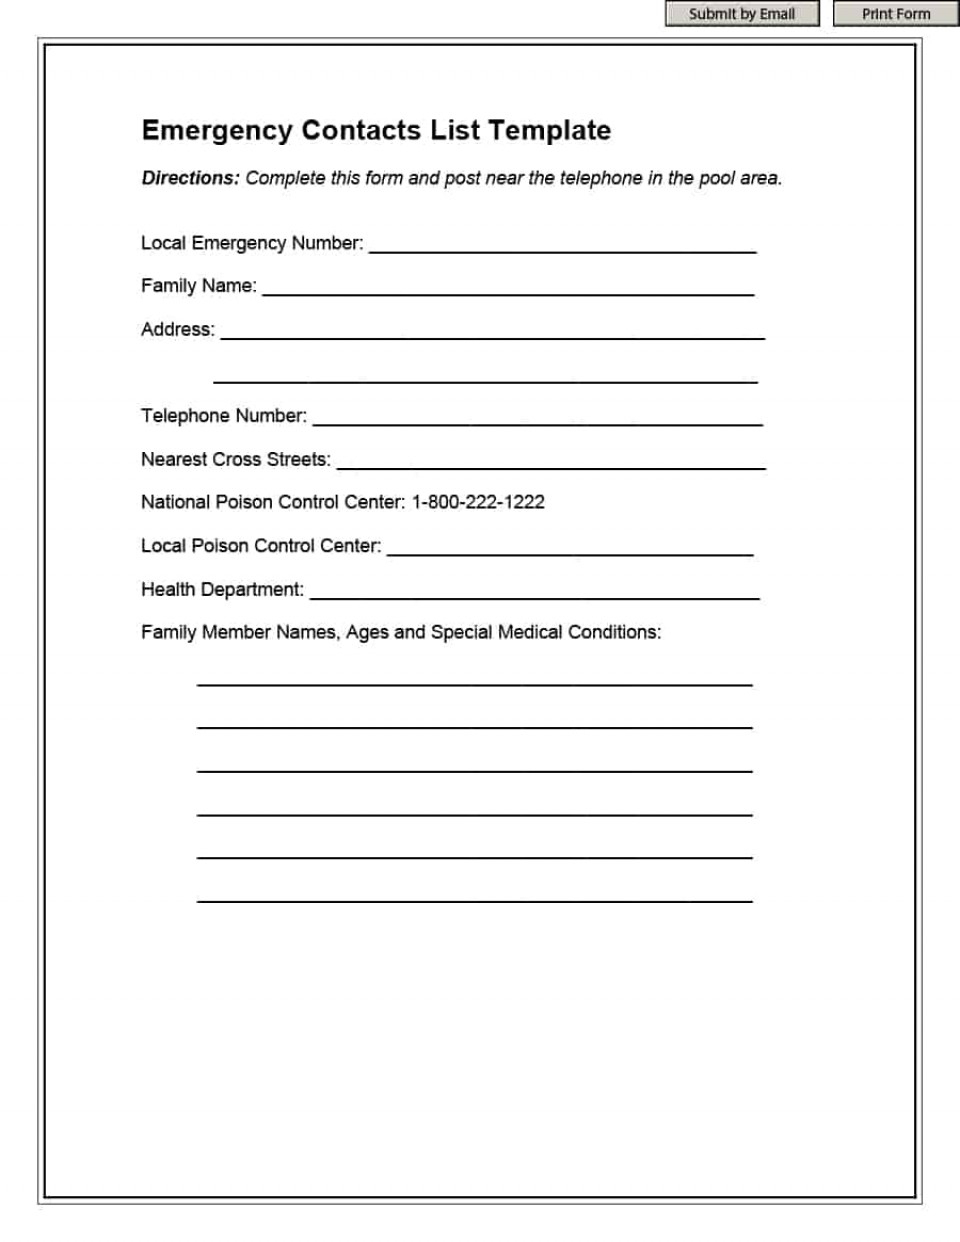 023 Weekly To Do List Template Ideas Emergency Phone ~ Ulyssesroom - Free Printable Emergency Phone List